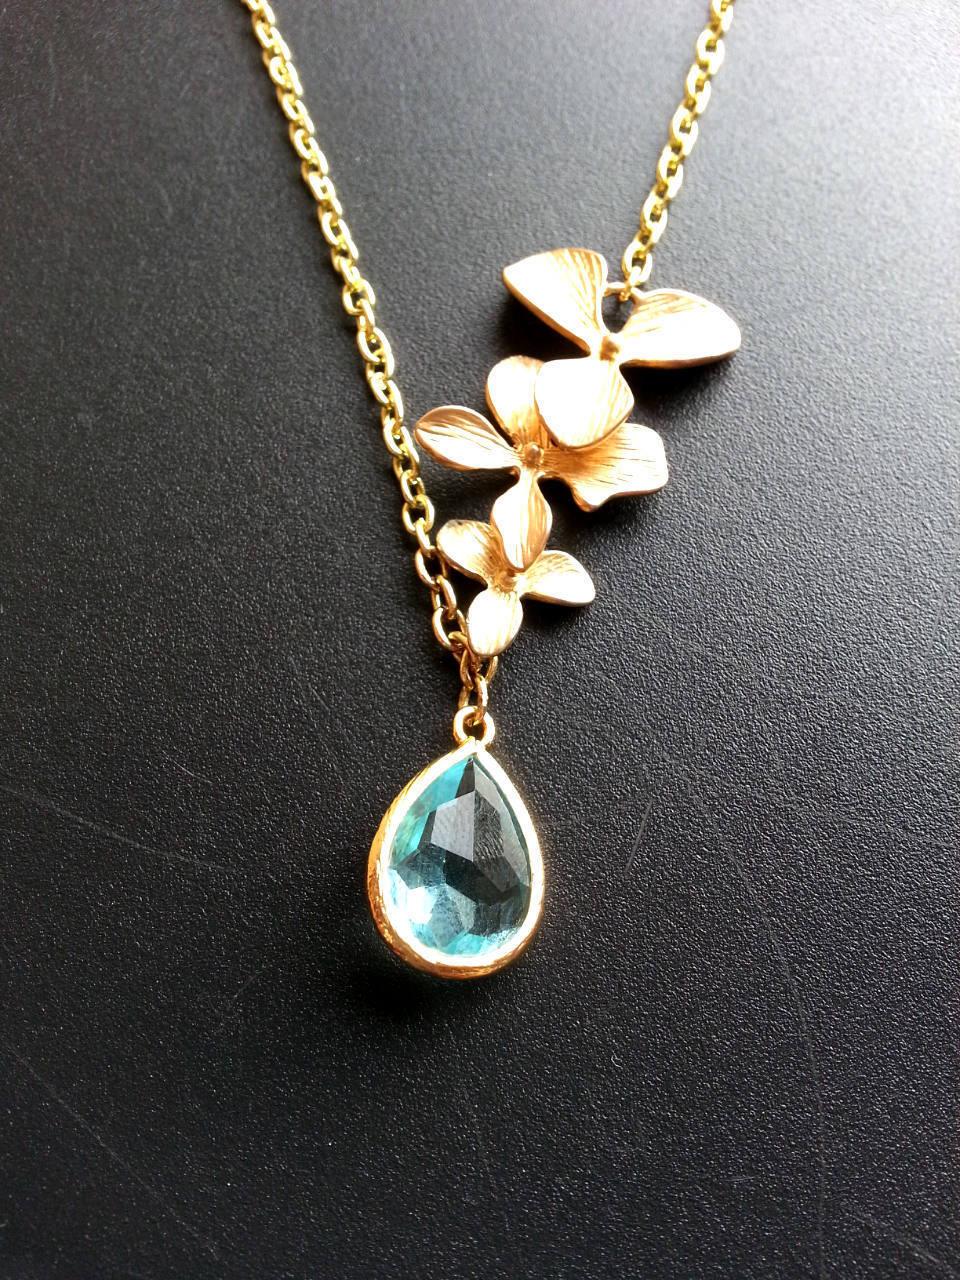 Aqua Teardrop Gem Lariat Gold Orchid Trio Necklace Bridal Necklace Aqua Gemstone